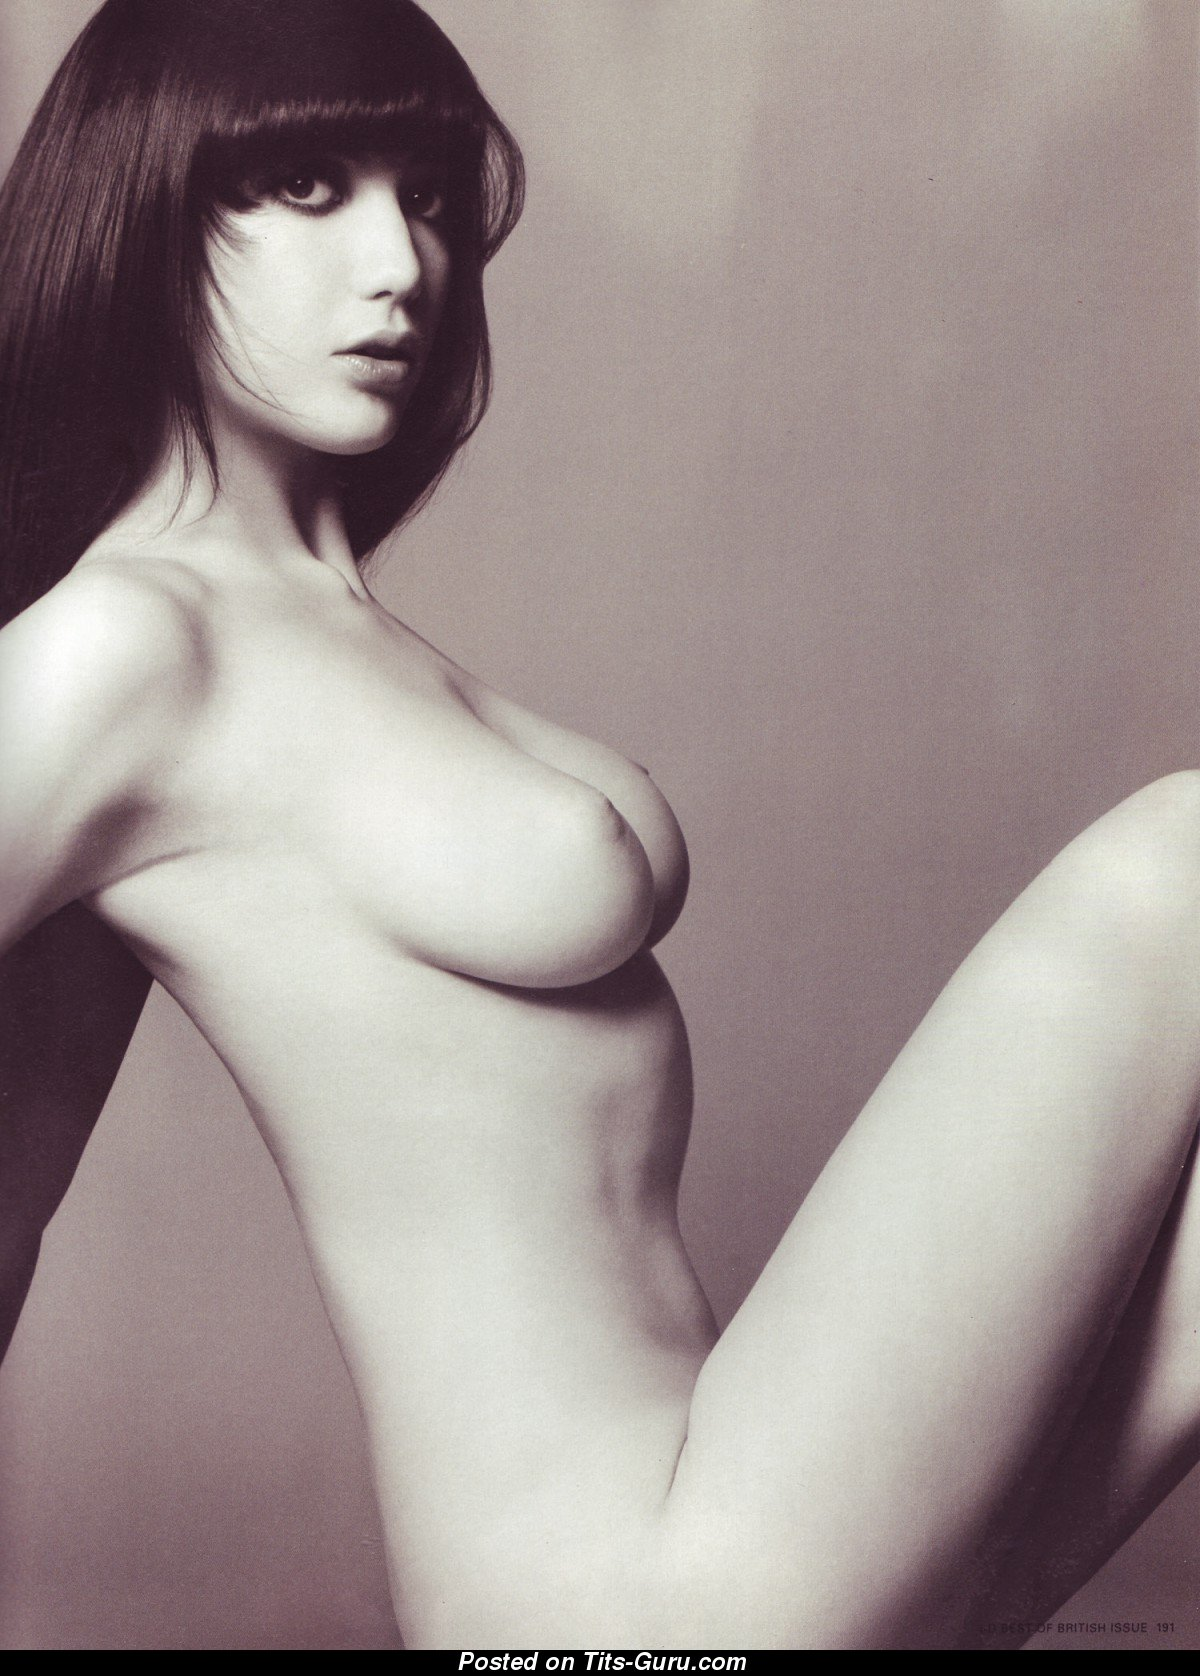 Actress butt tush ass Daisy lowe sexy nude sex ipad pics images